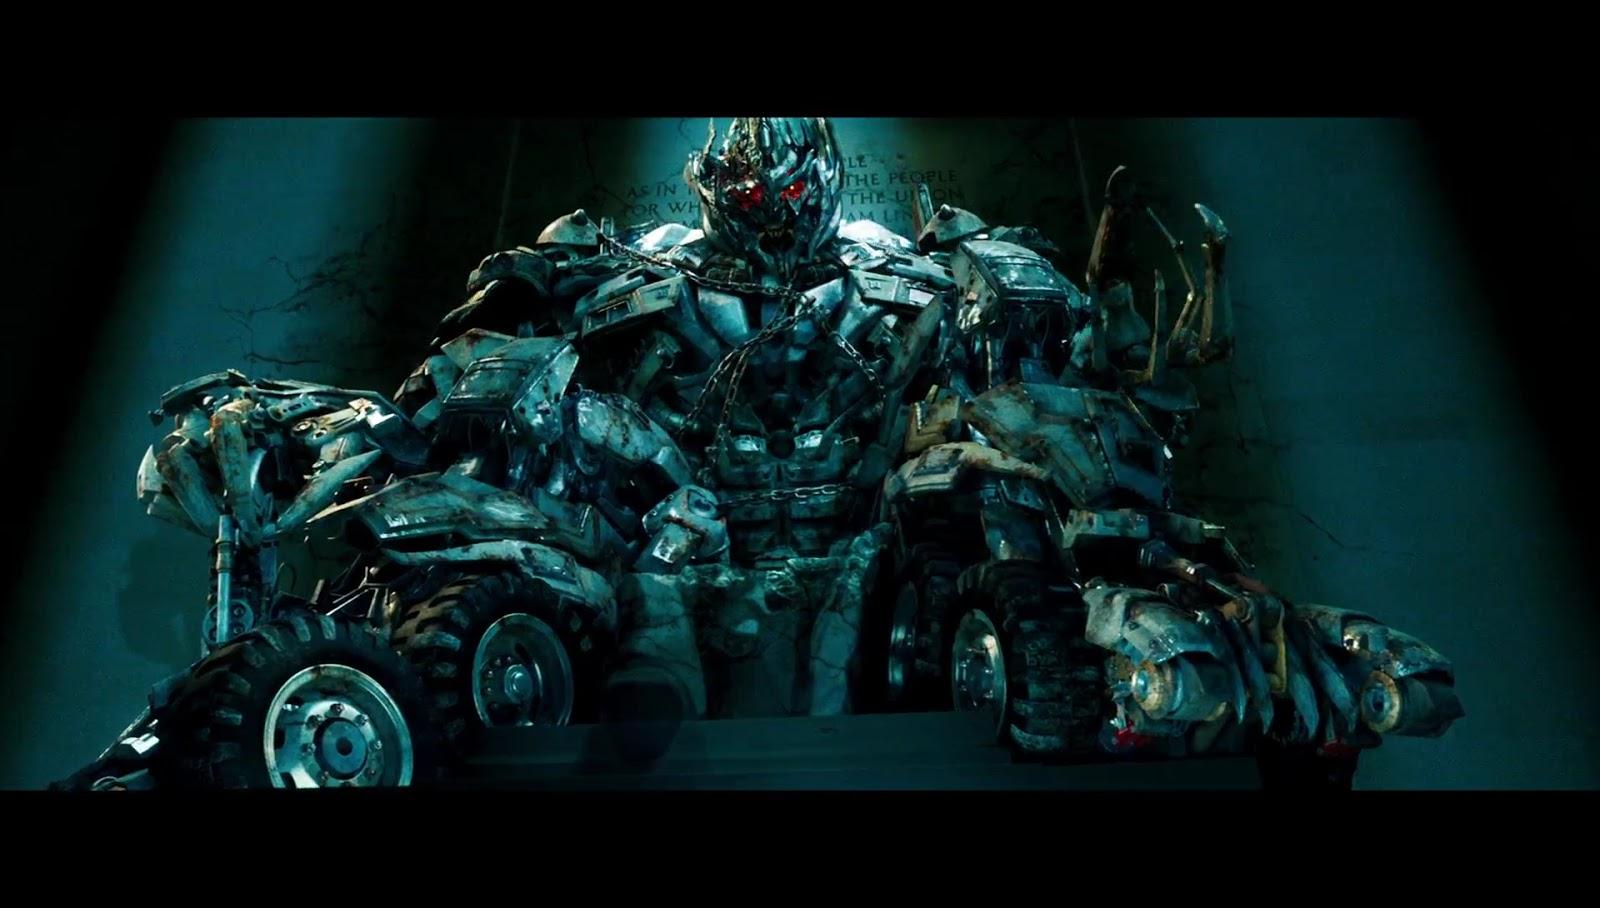 capturas Transformers%2B3%2BEl%2BLado%2BOscuro%2BDe%2BLa%2BLuna%2B%25282011%2529%2BBRRip%2BDual%2BLatino%2B1080p 1